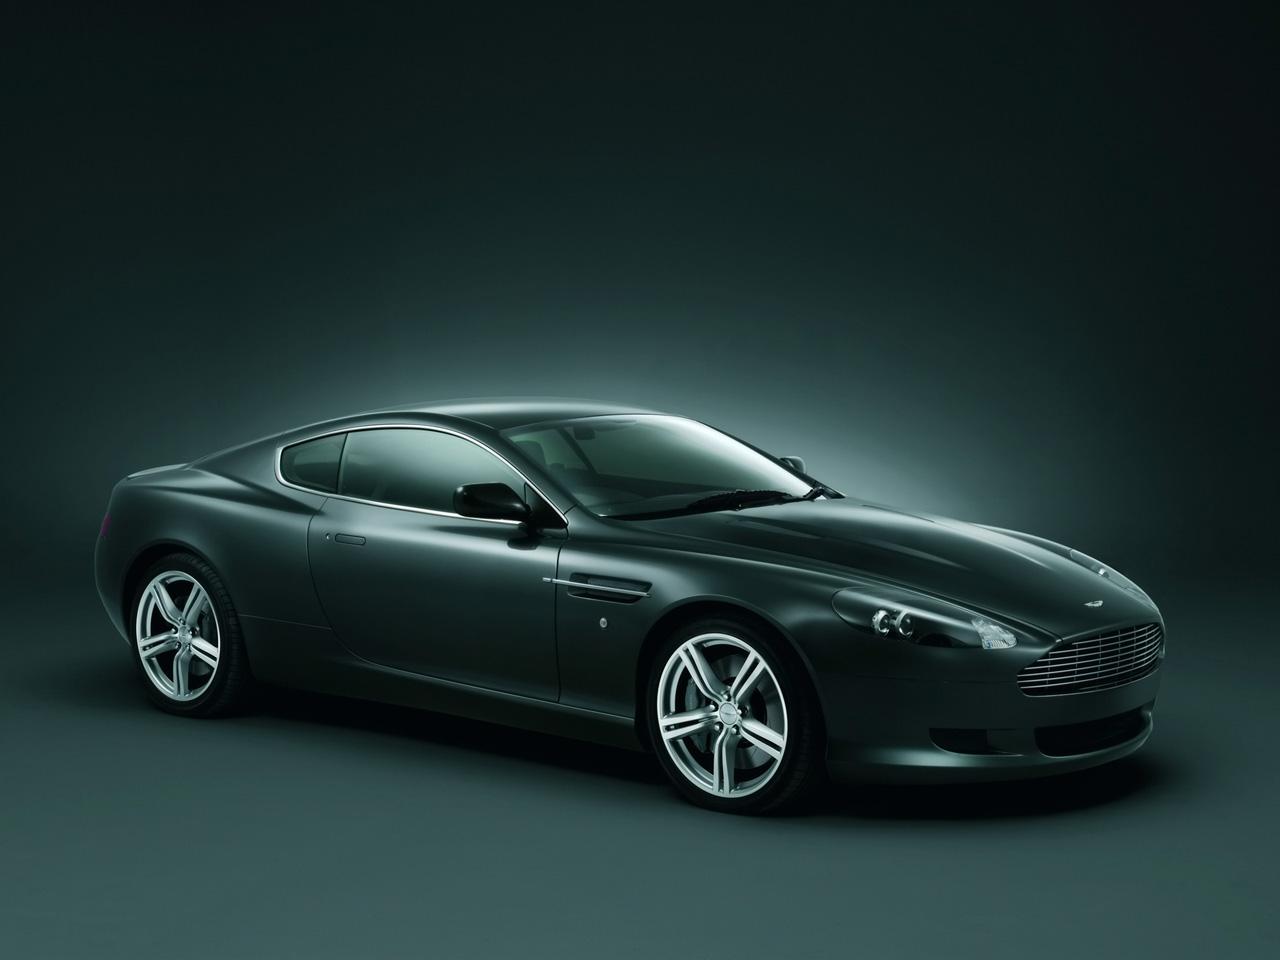 http://2.bp.blogspot.com/-X07FArwsQng/TdKbYkyrx4I/AAAAAAAACmo/hpdYb2dC_5o/s1600/Aston-Martin-DB-9-sideview.jpg